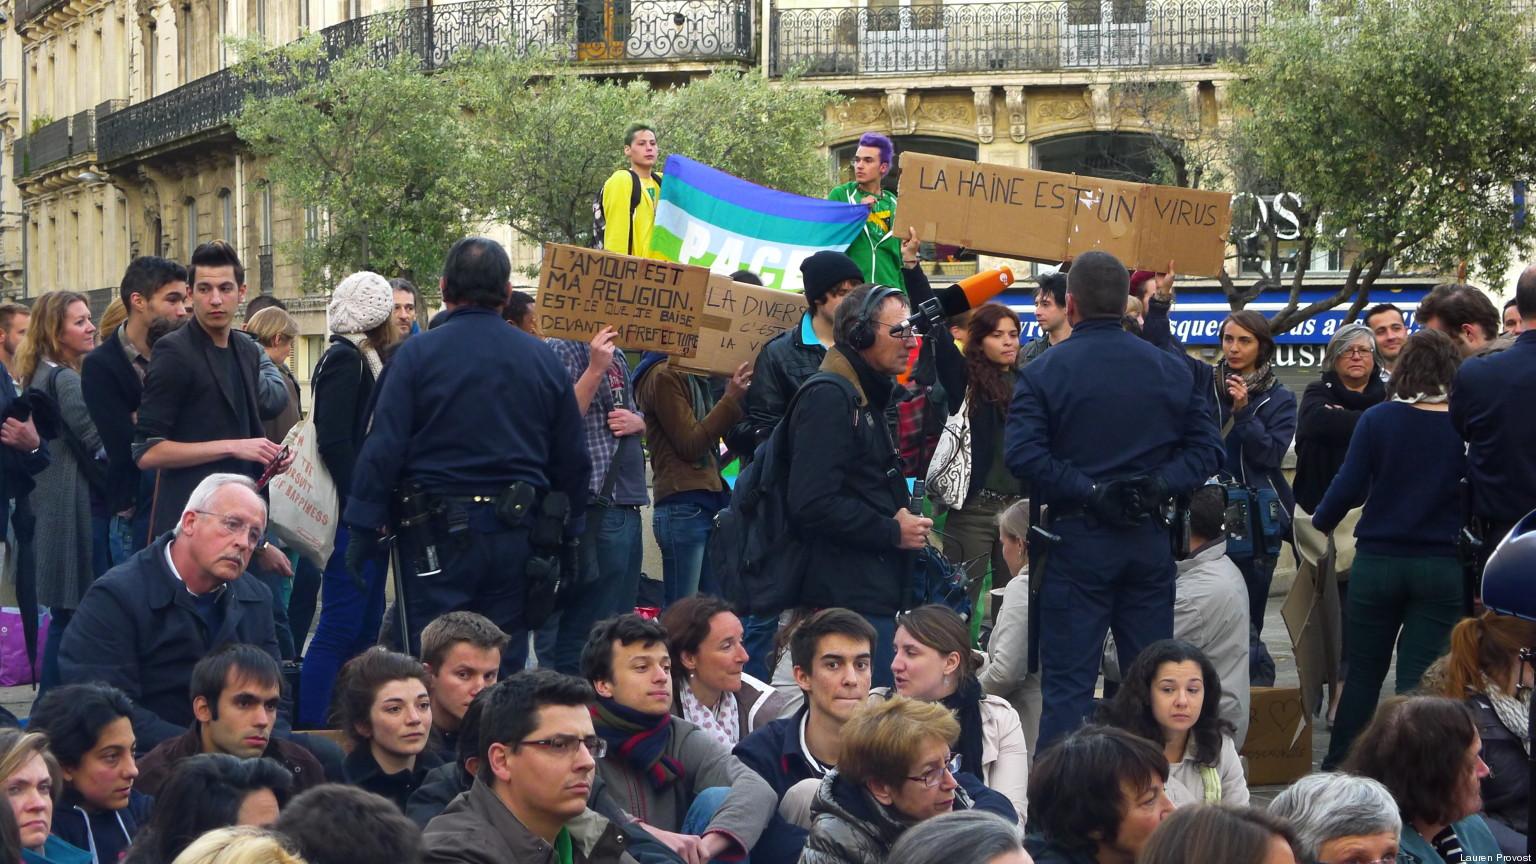 rencontre gay montpellier à Courbevoie